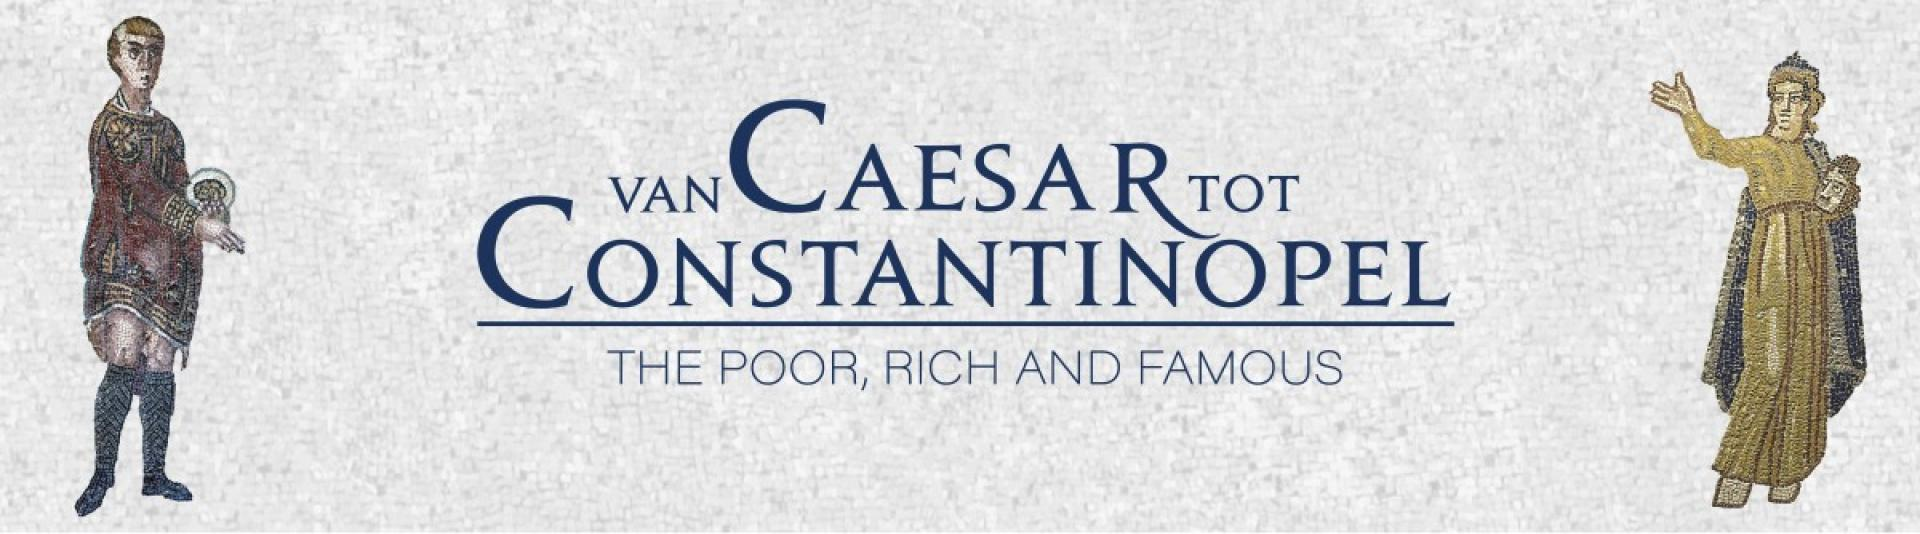 Winter Tentoonstelling: Van Caesar tot Constantinopel